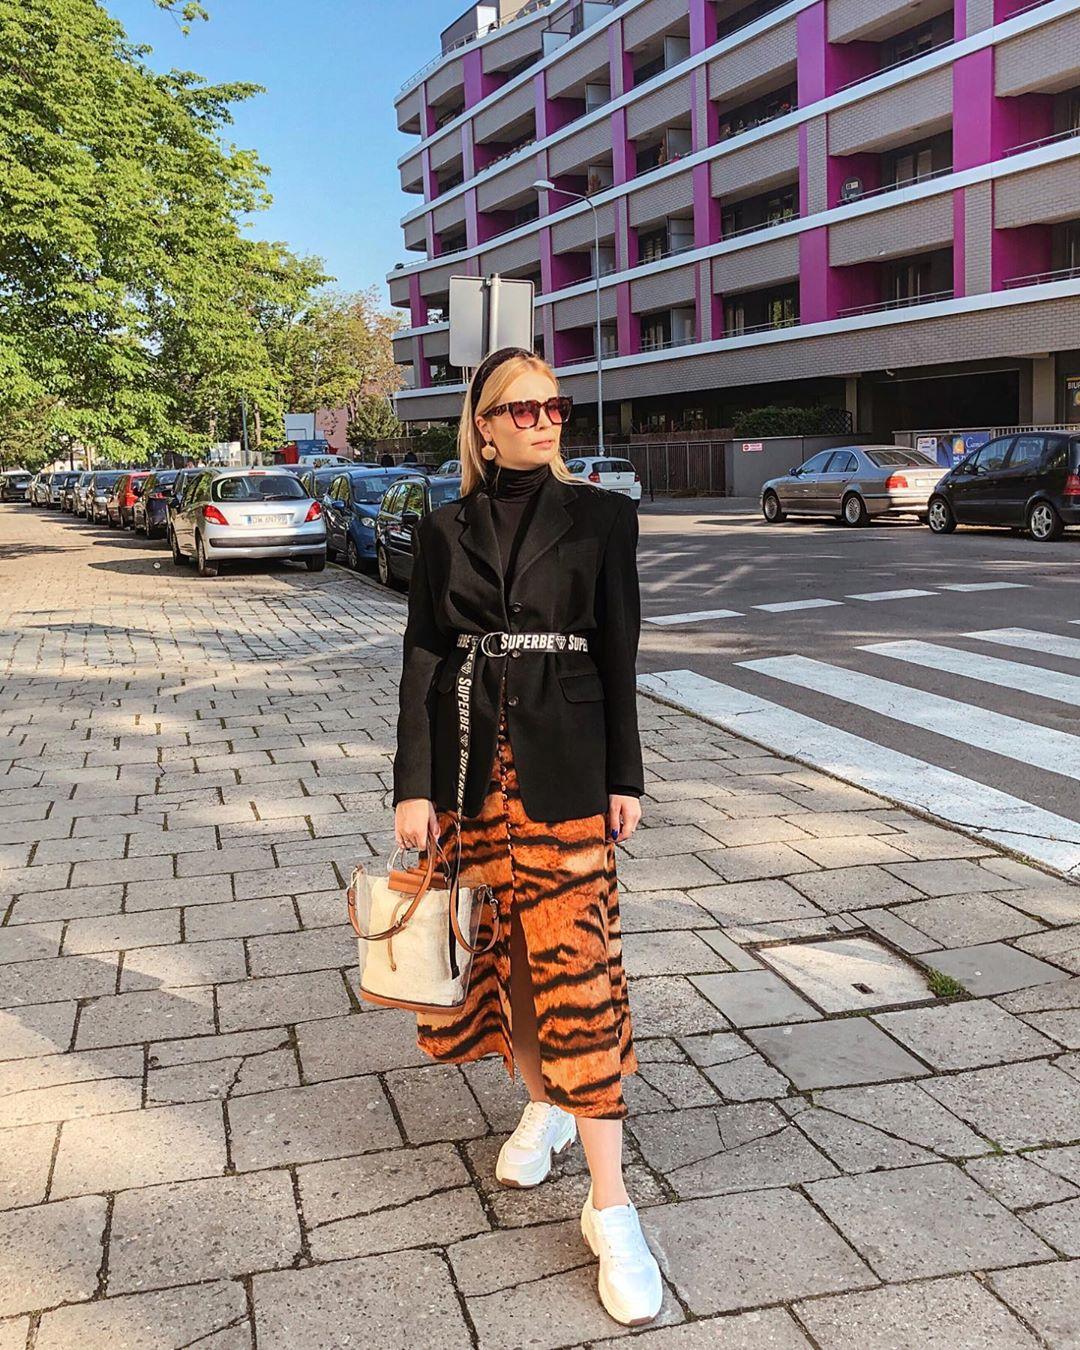 sac shopper en vinyle de Zara sur lawirantka